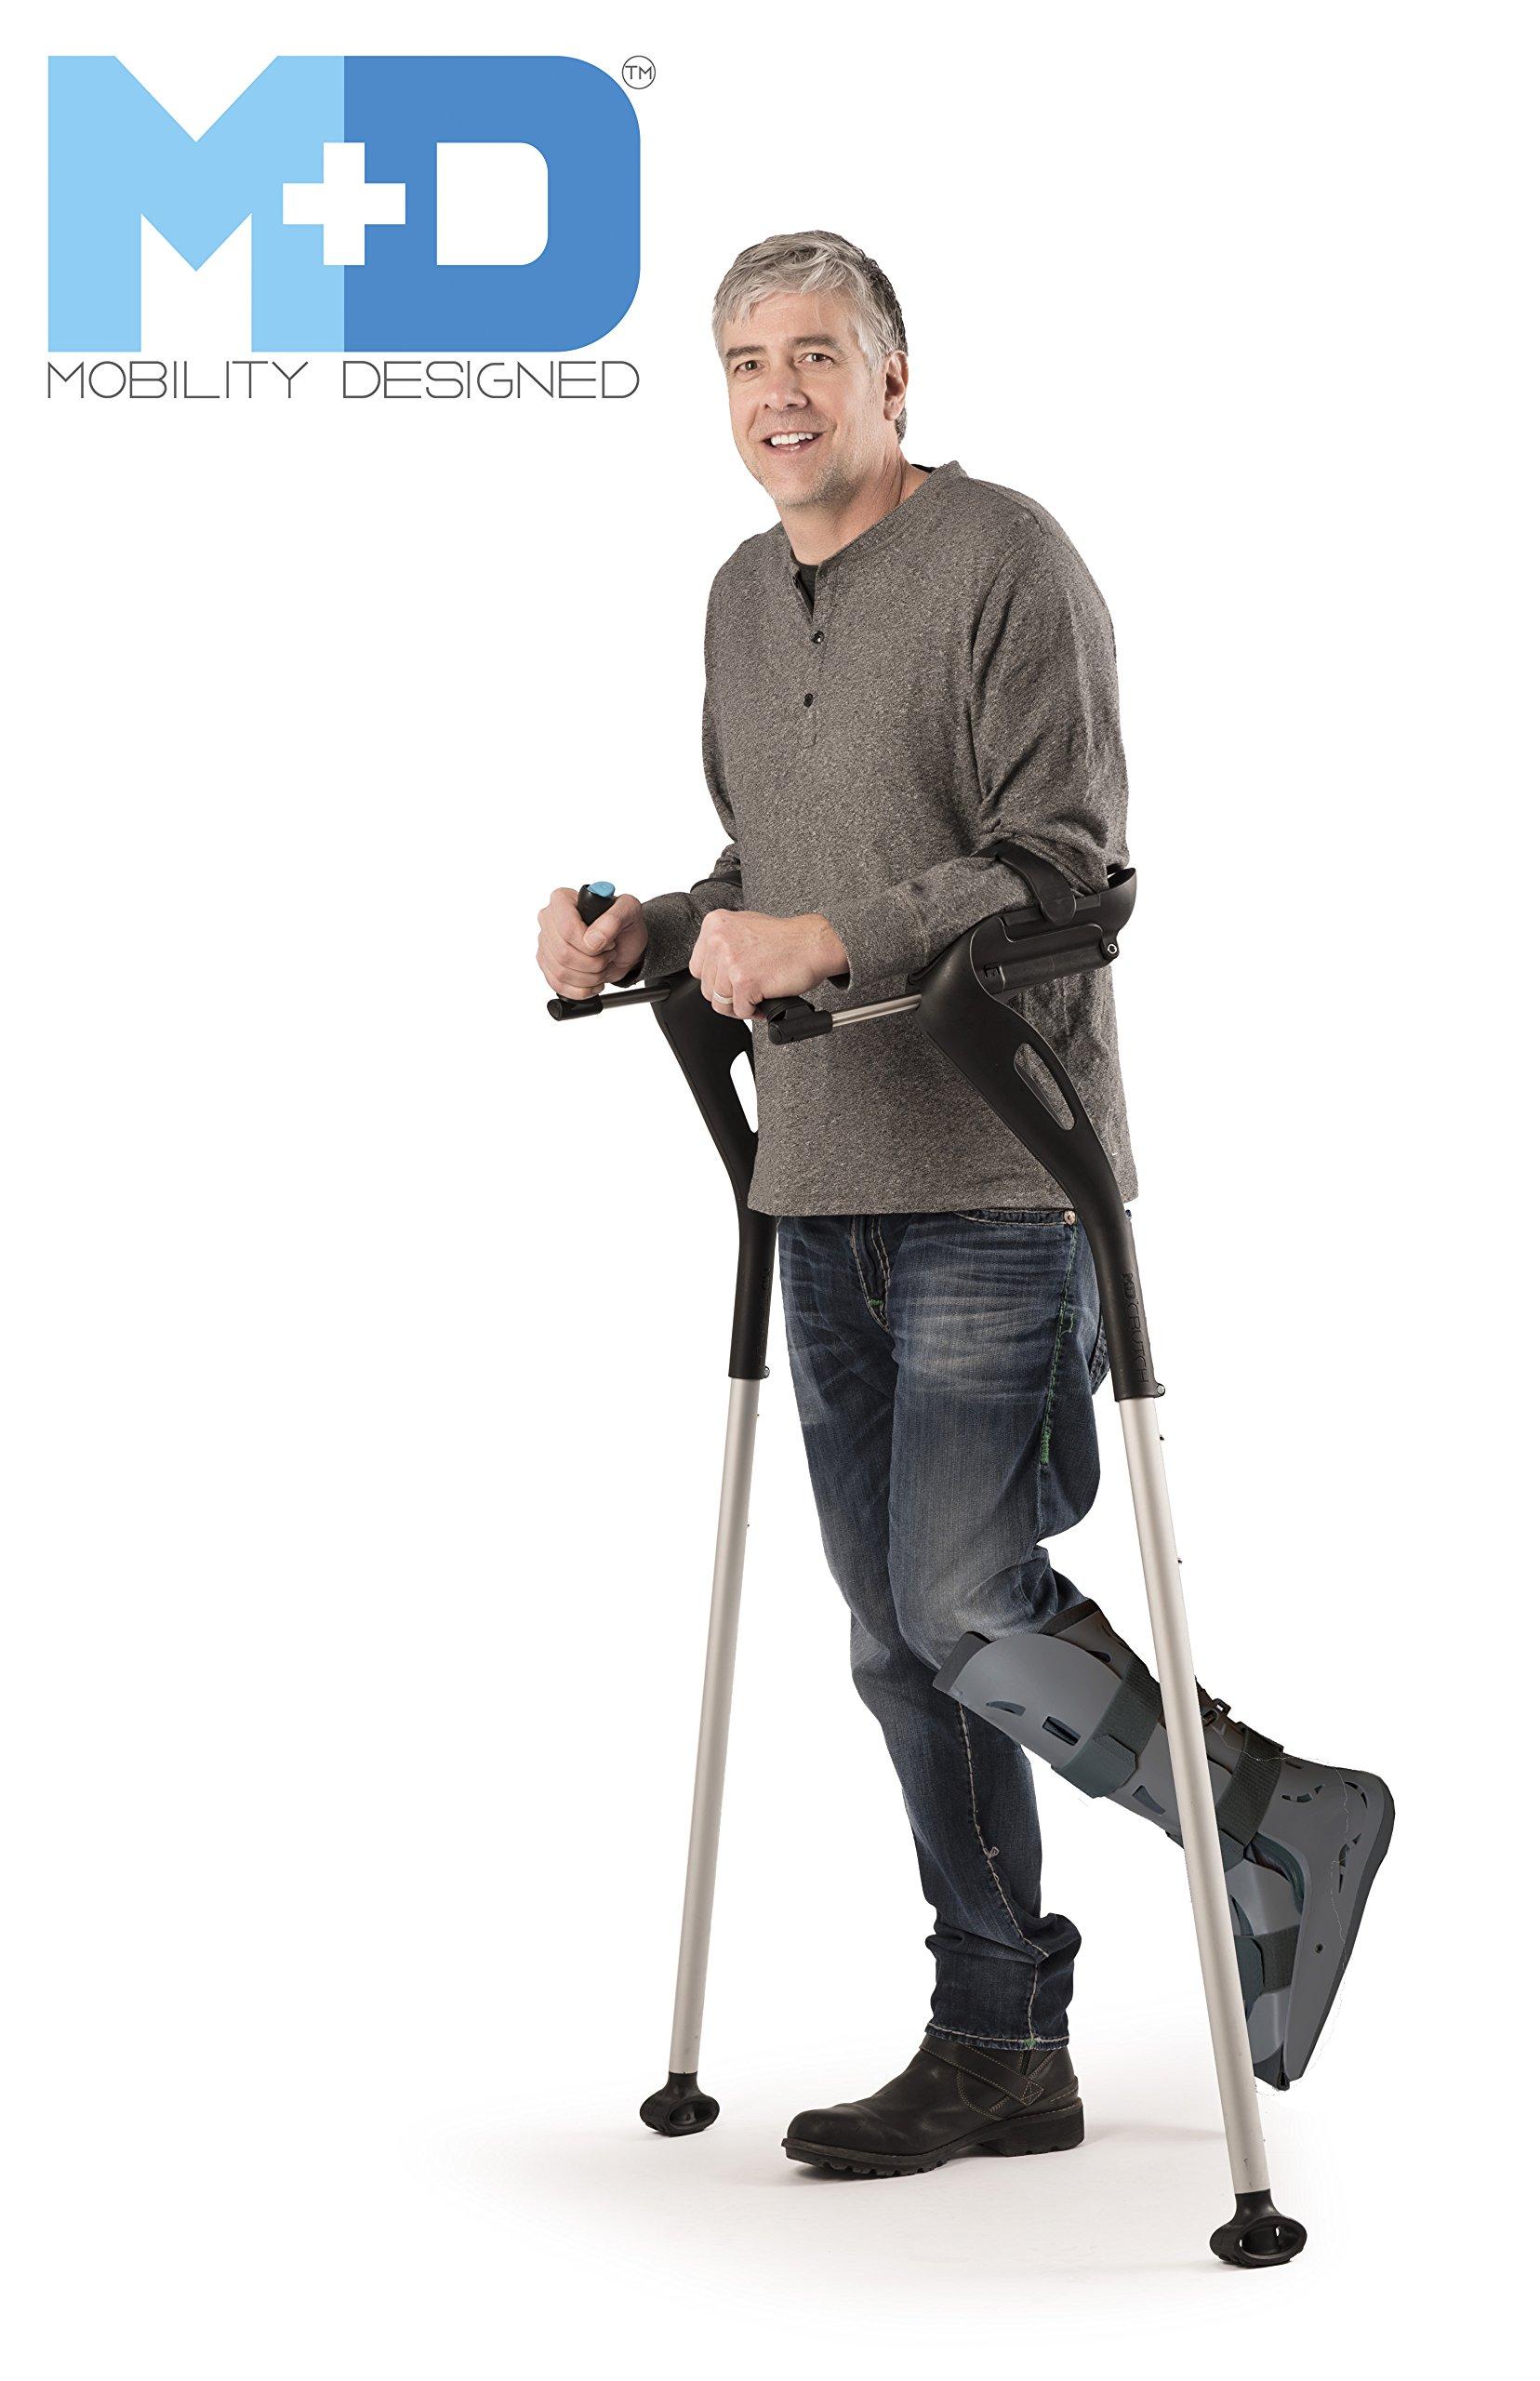 Mobility Designed Hands free Ergonomic Crutches